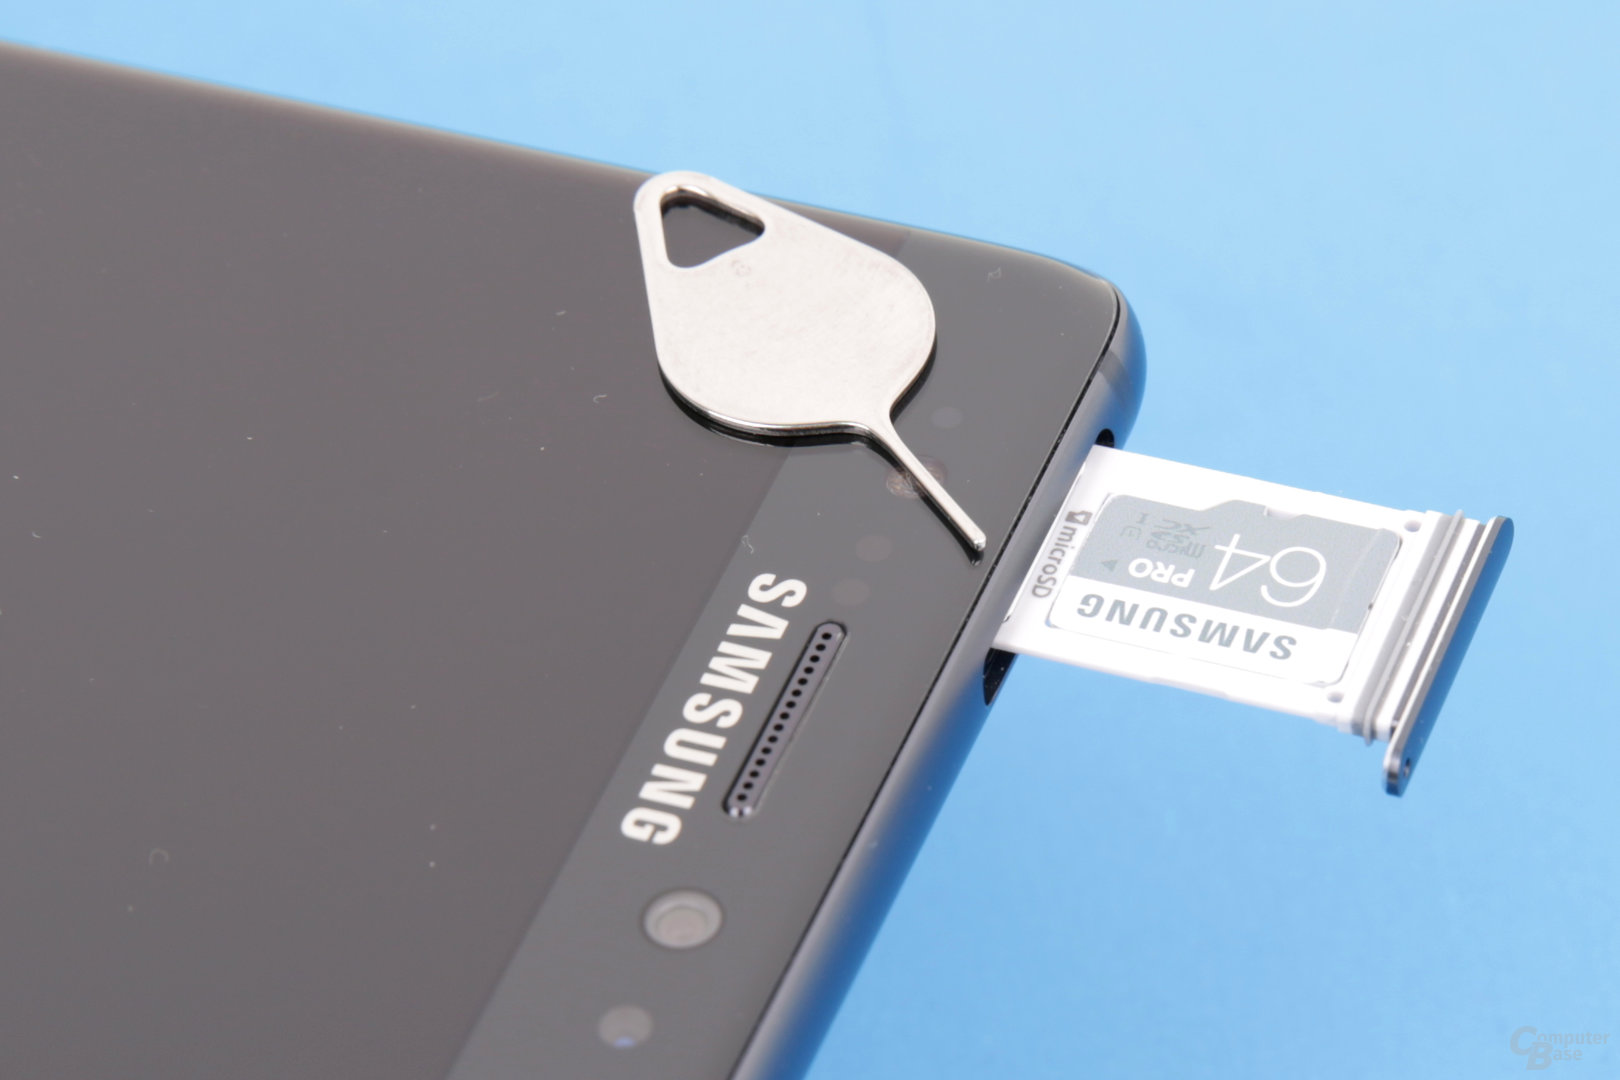 Nano-SIM-Fach nimmt auch microSD-Karte auf